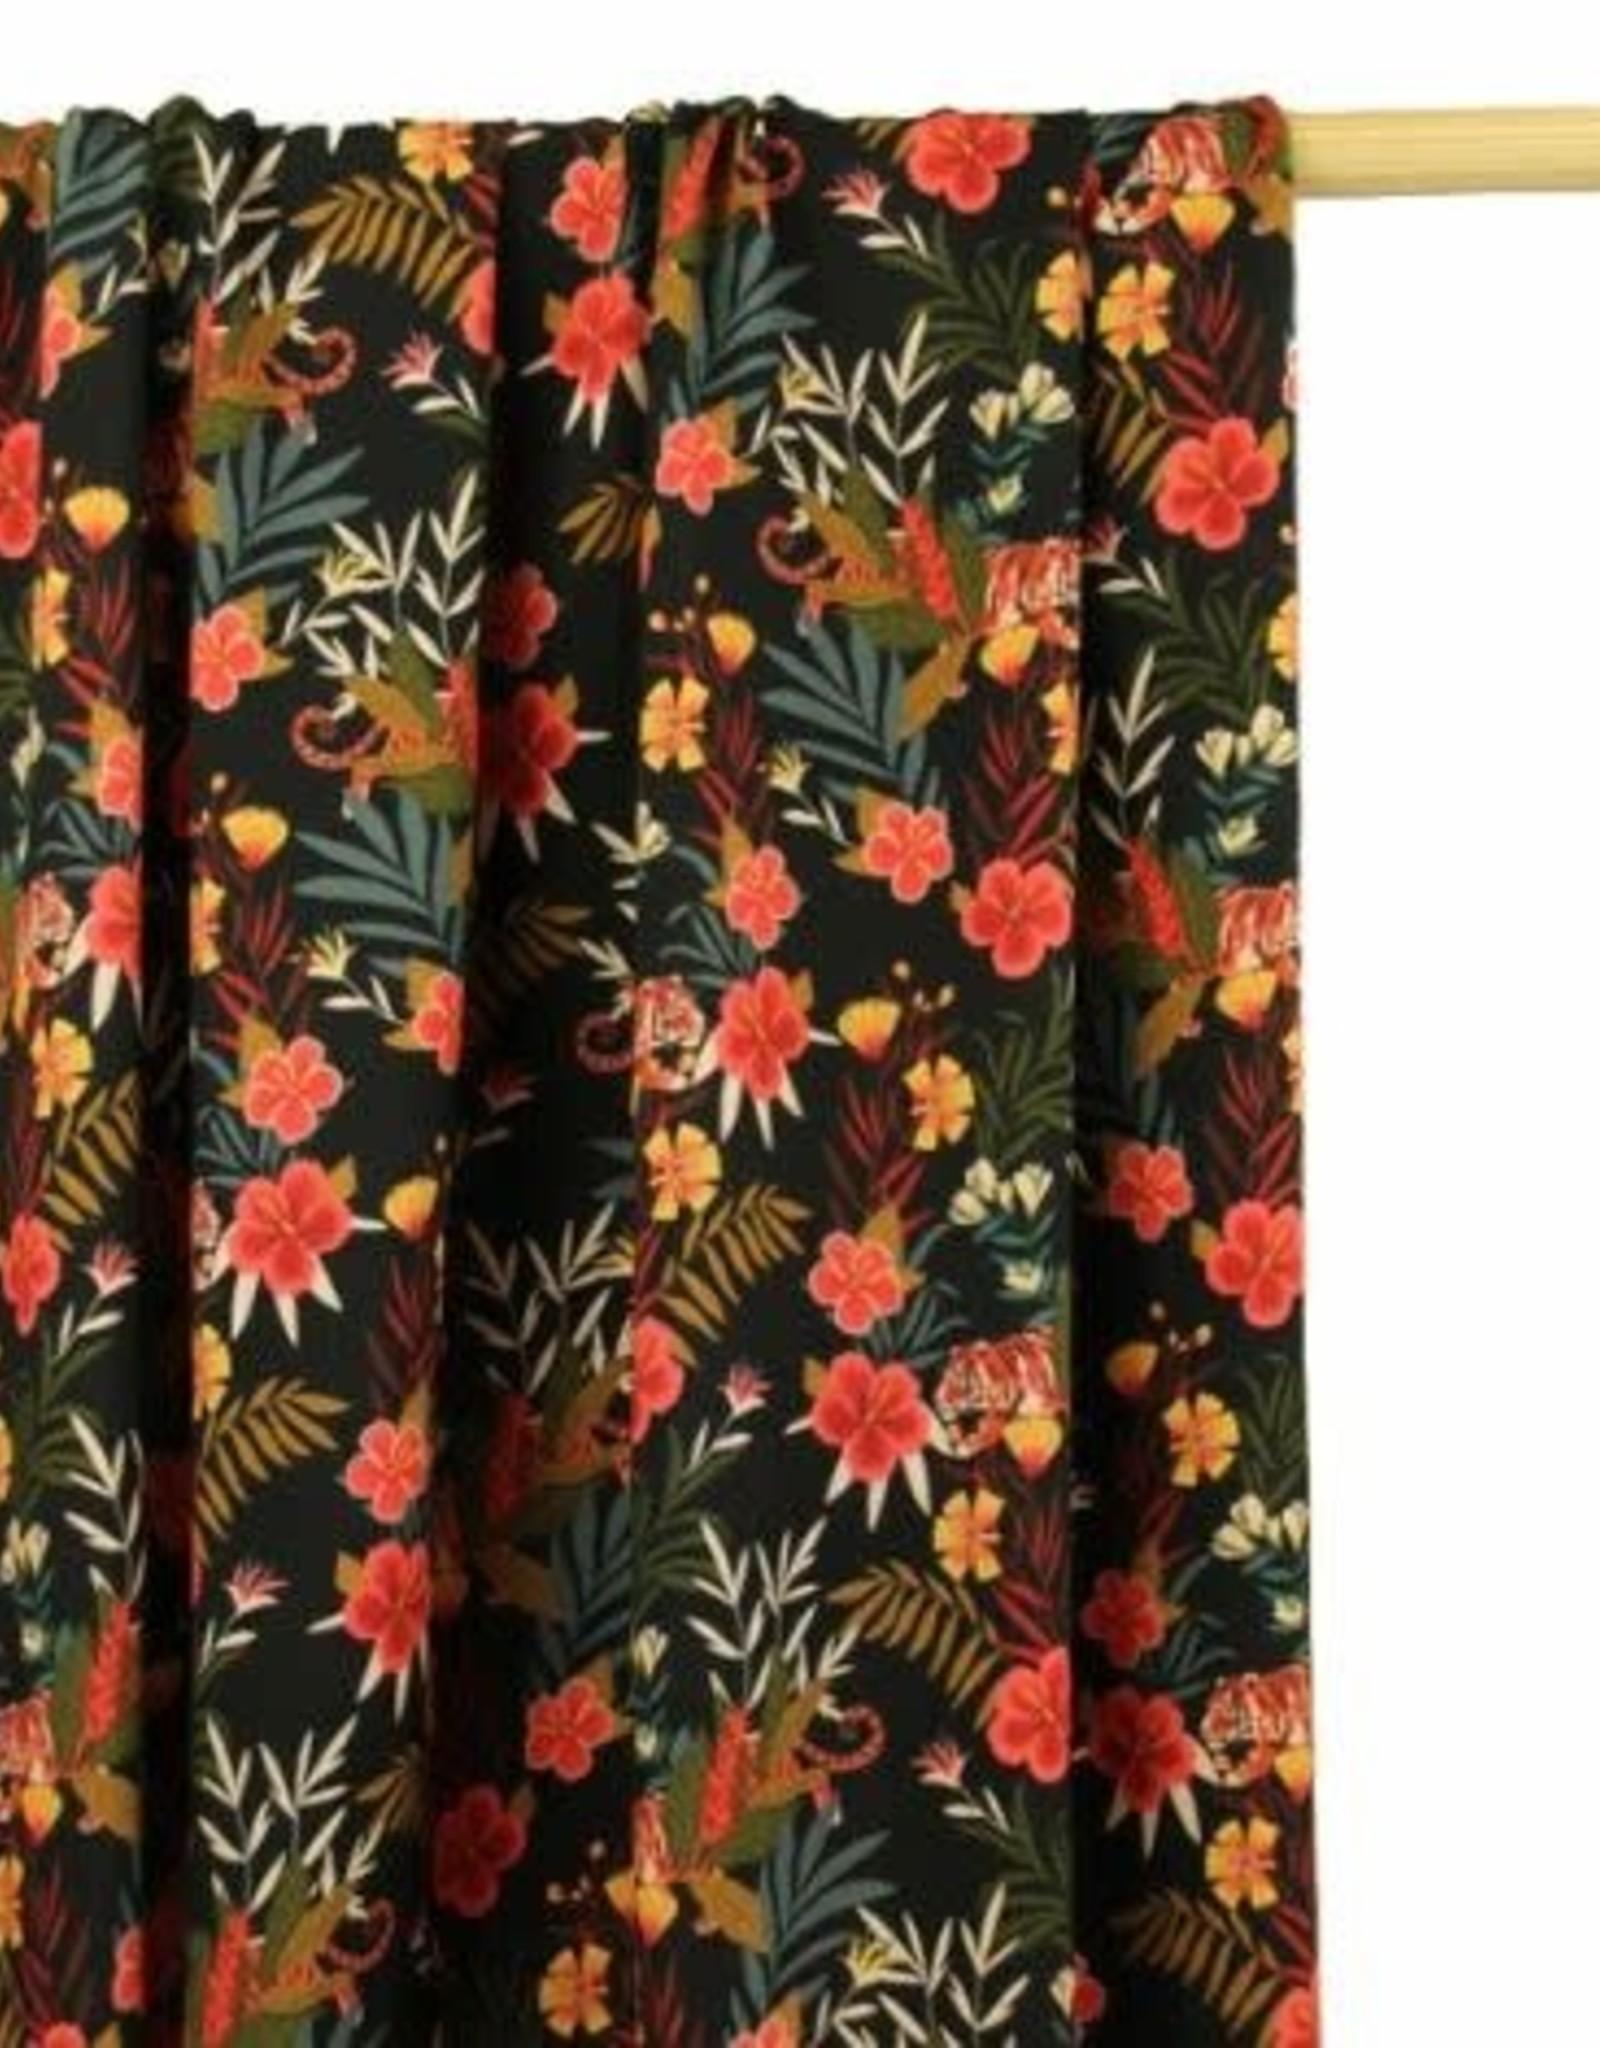 Atelier Jupe Viscose kleurrijke jungleprint